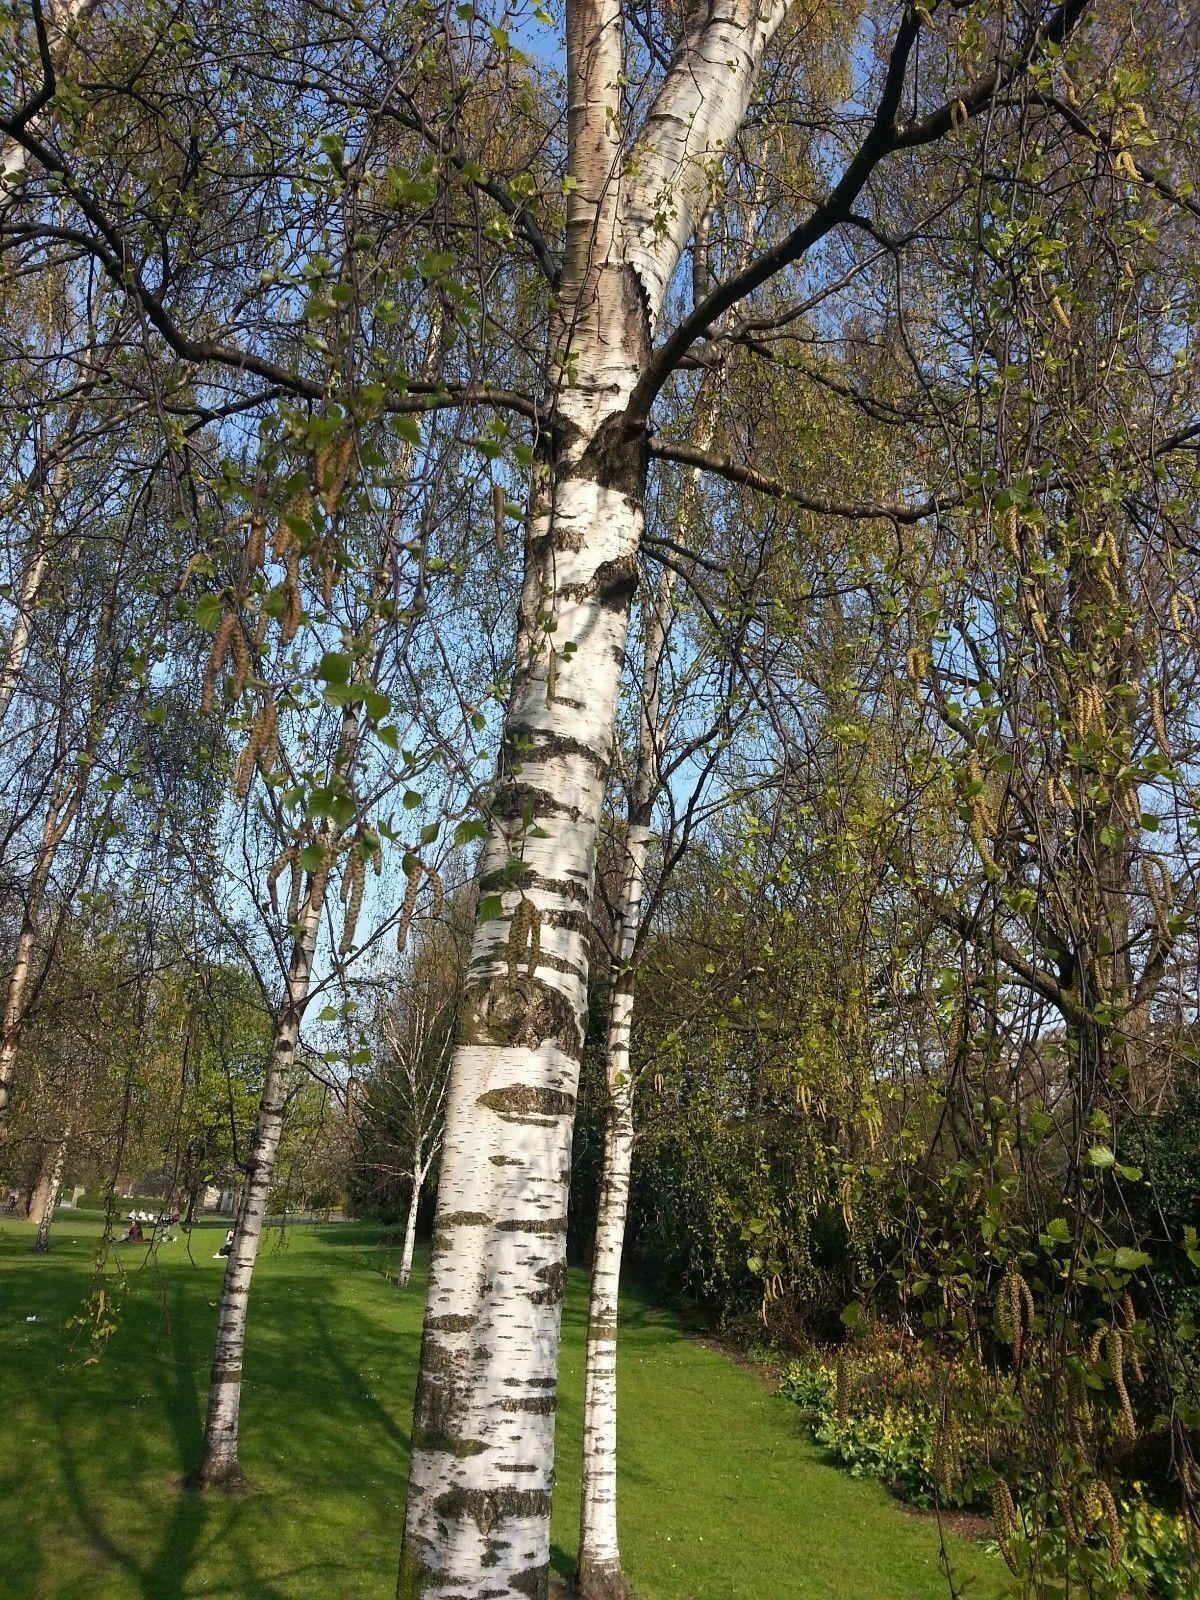 5 Silver Birch Trees 2-3ft,Stunning Winter Colour,Betula Pendula Plants,60-90cm